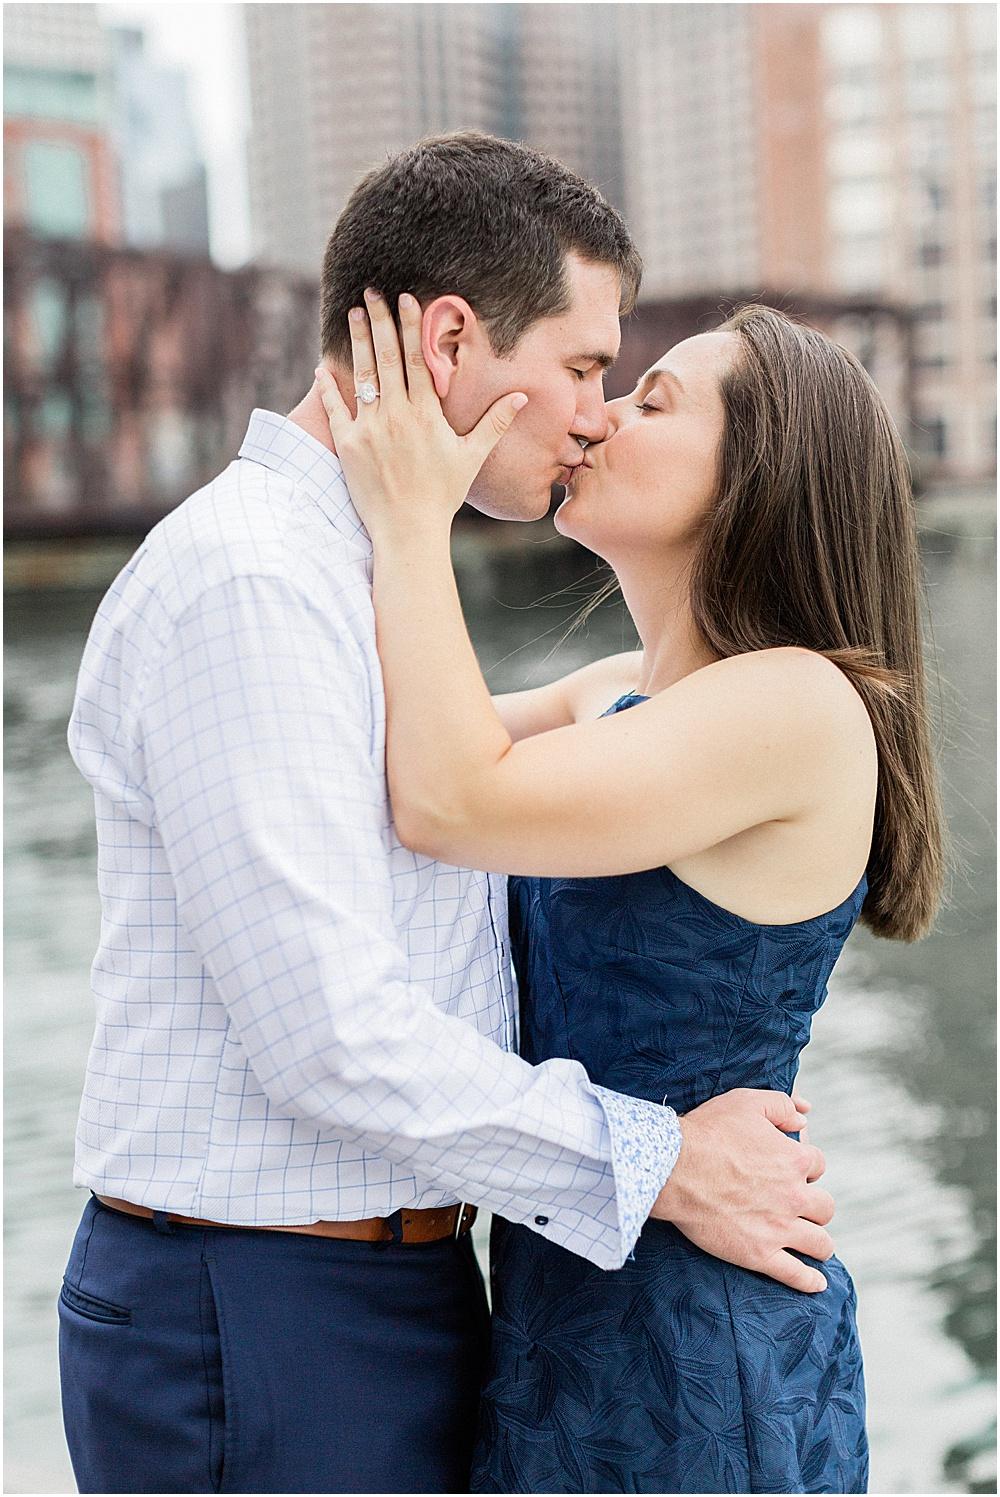 ica_kelsey_Zach_york_maine_boston_seaport_enagement_session_cape_cod_massachusetts_boston_wedding_photographer_meredith_jane_photography_photo_0630.jpg